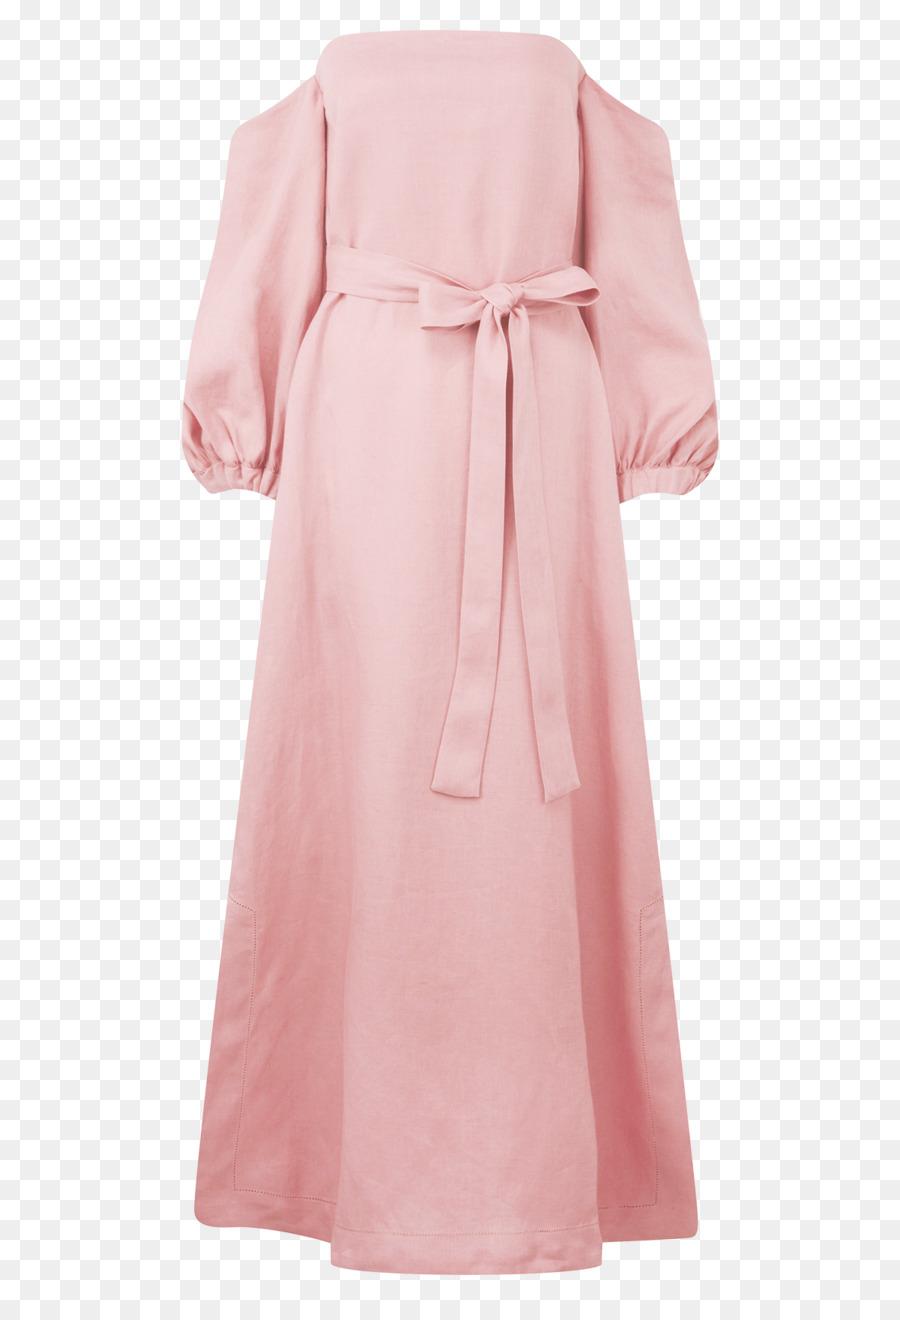 Túnica Hombro Vestido De Manga Rosa M - vestido Formatos De Archivo ...